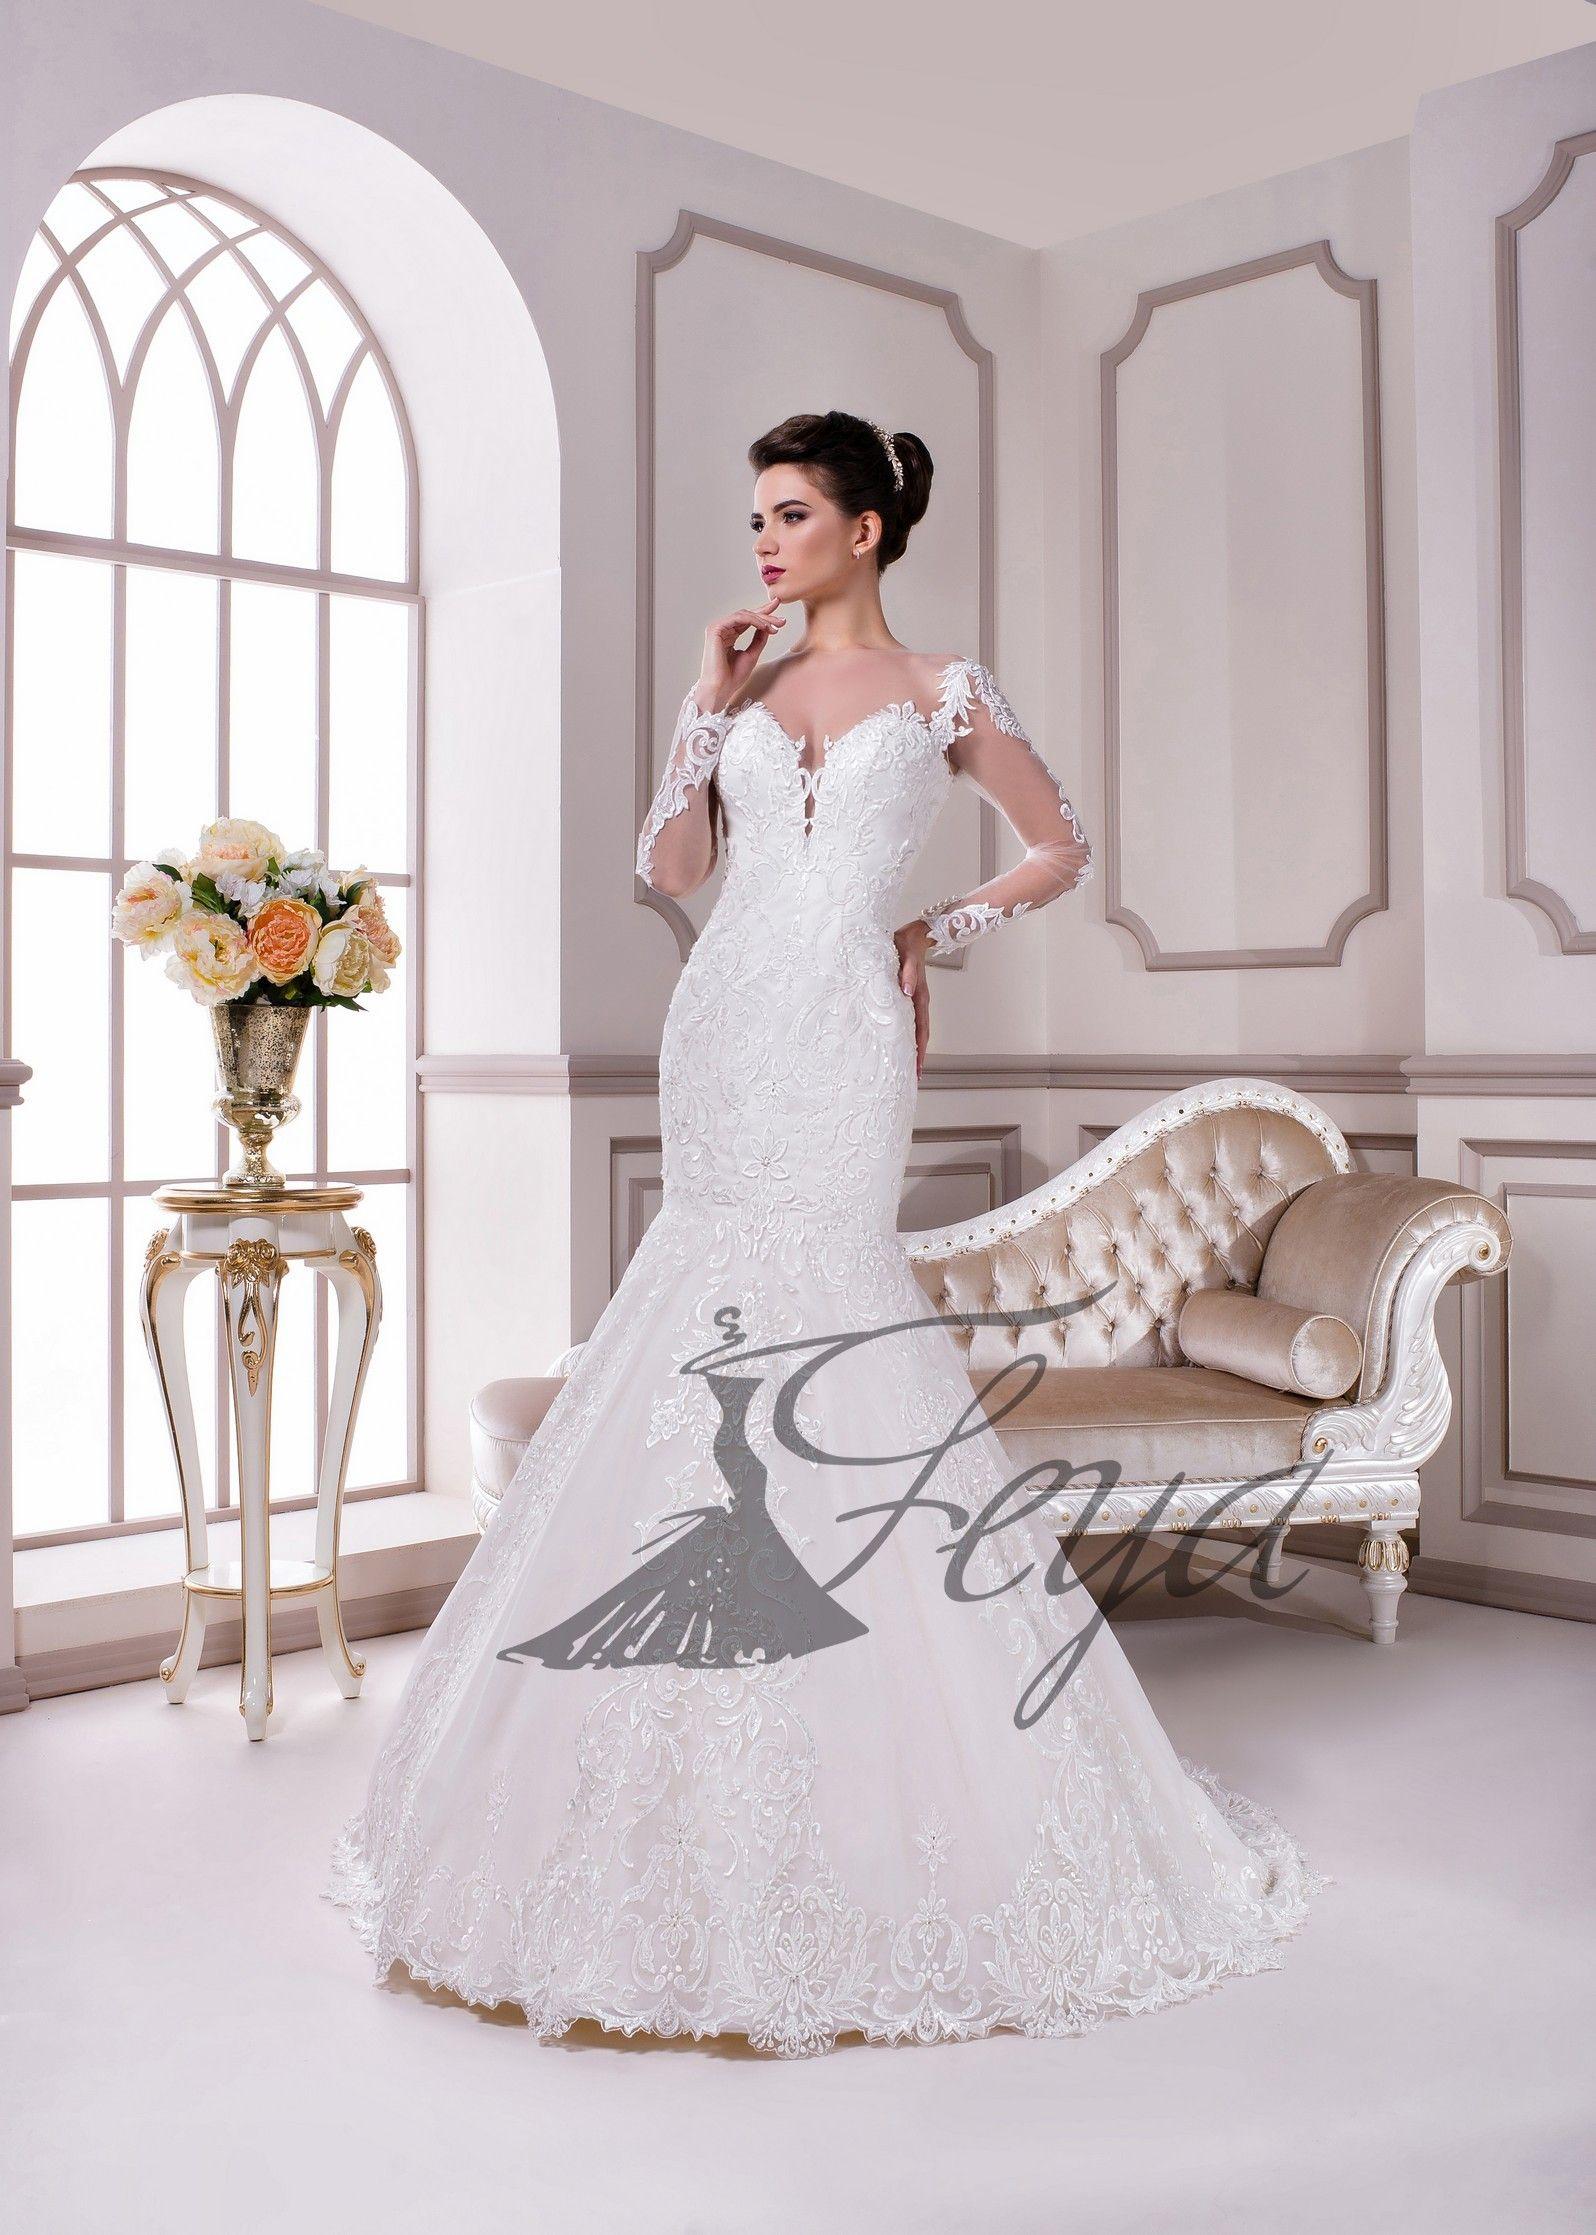 Feyabridal wedding dress margaret mermaid wedding dress new look